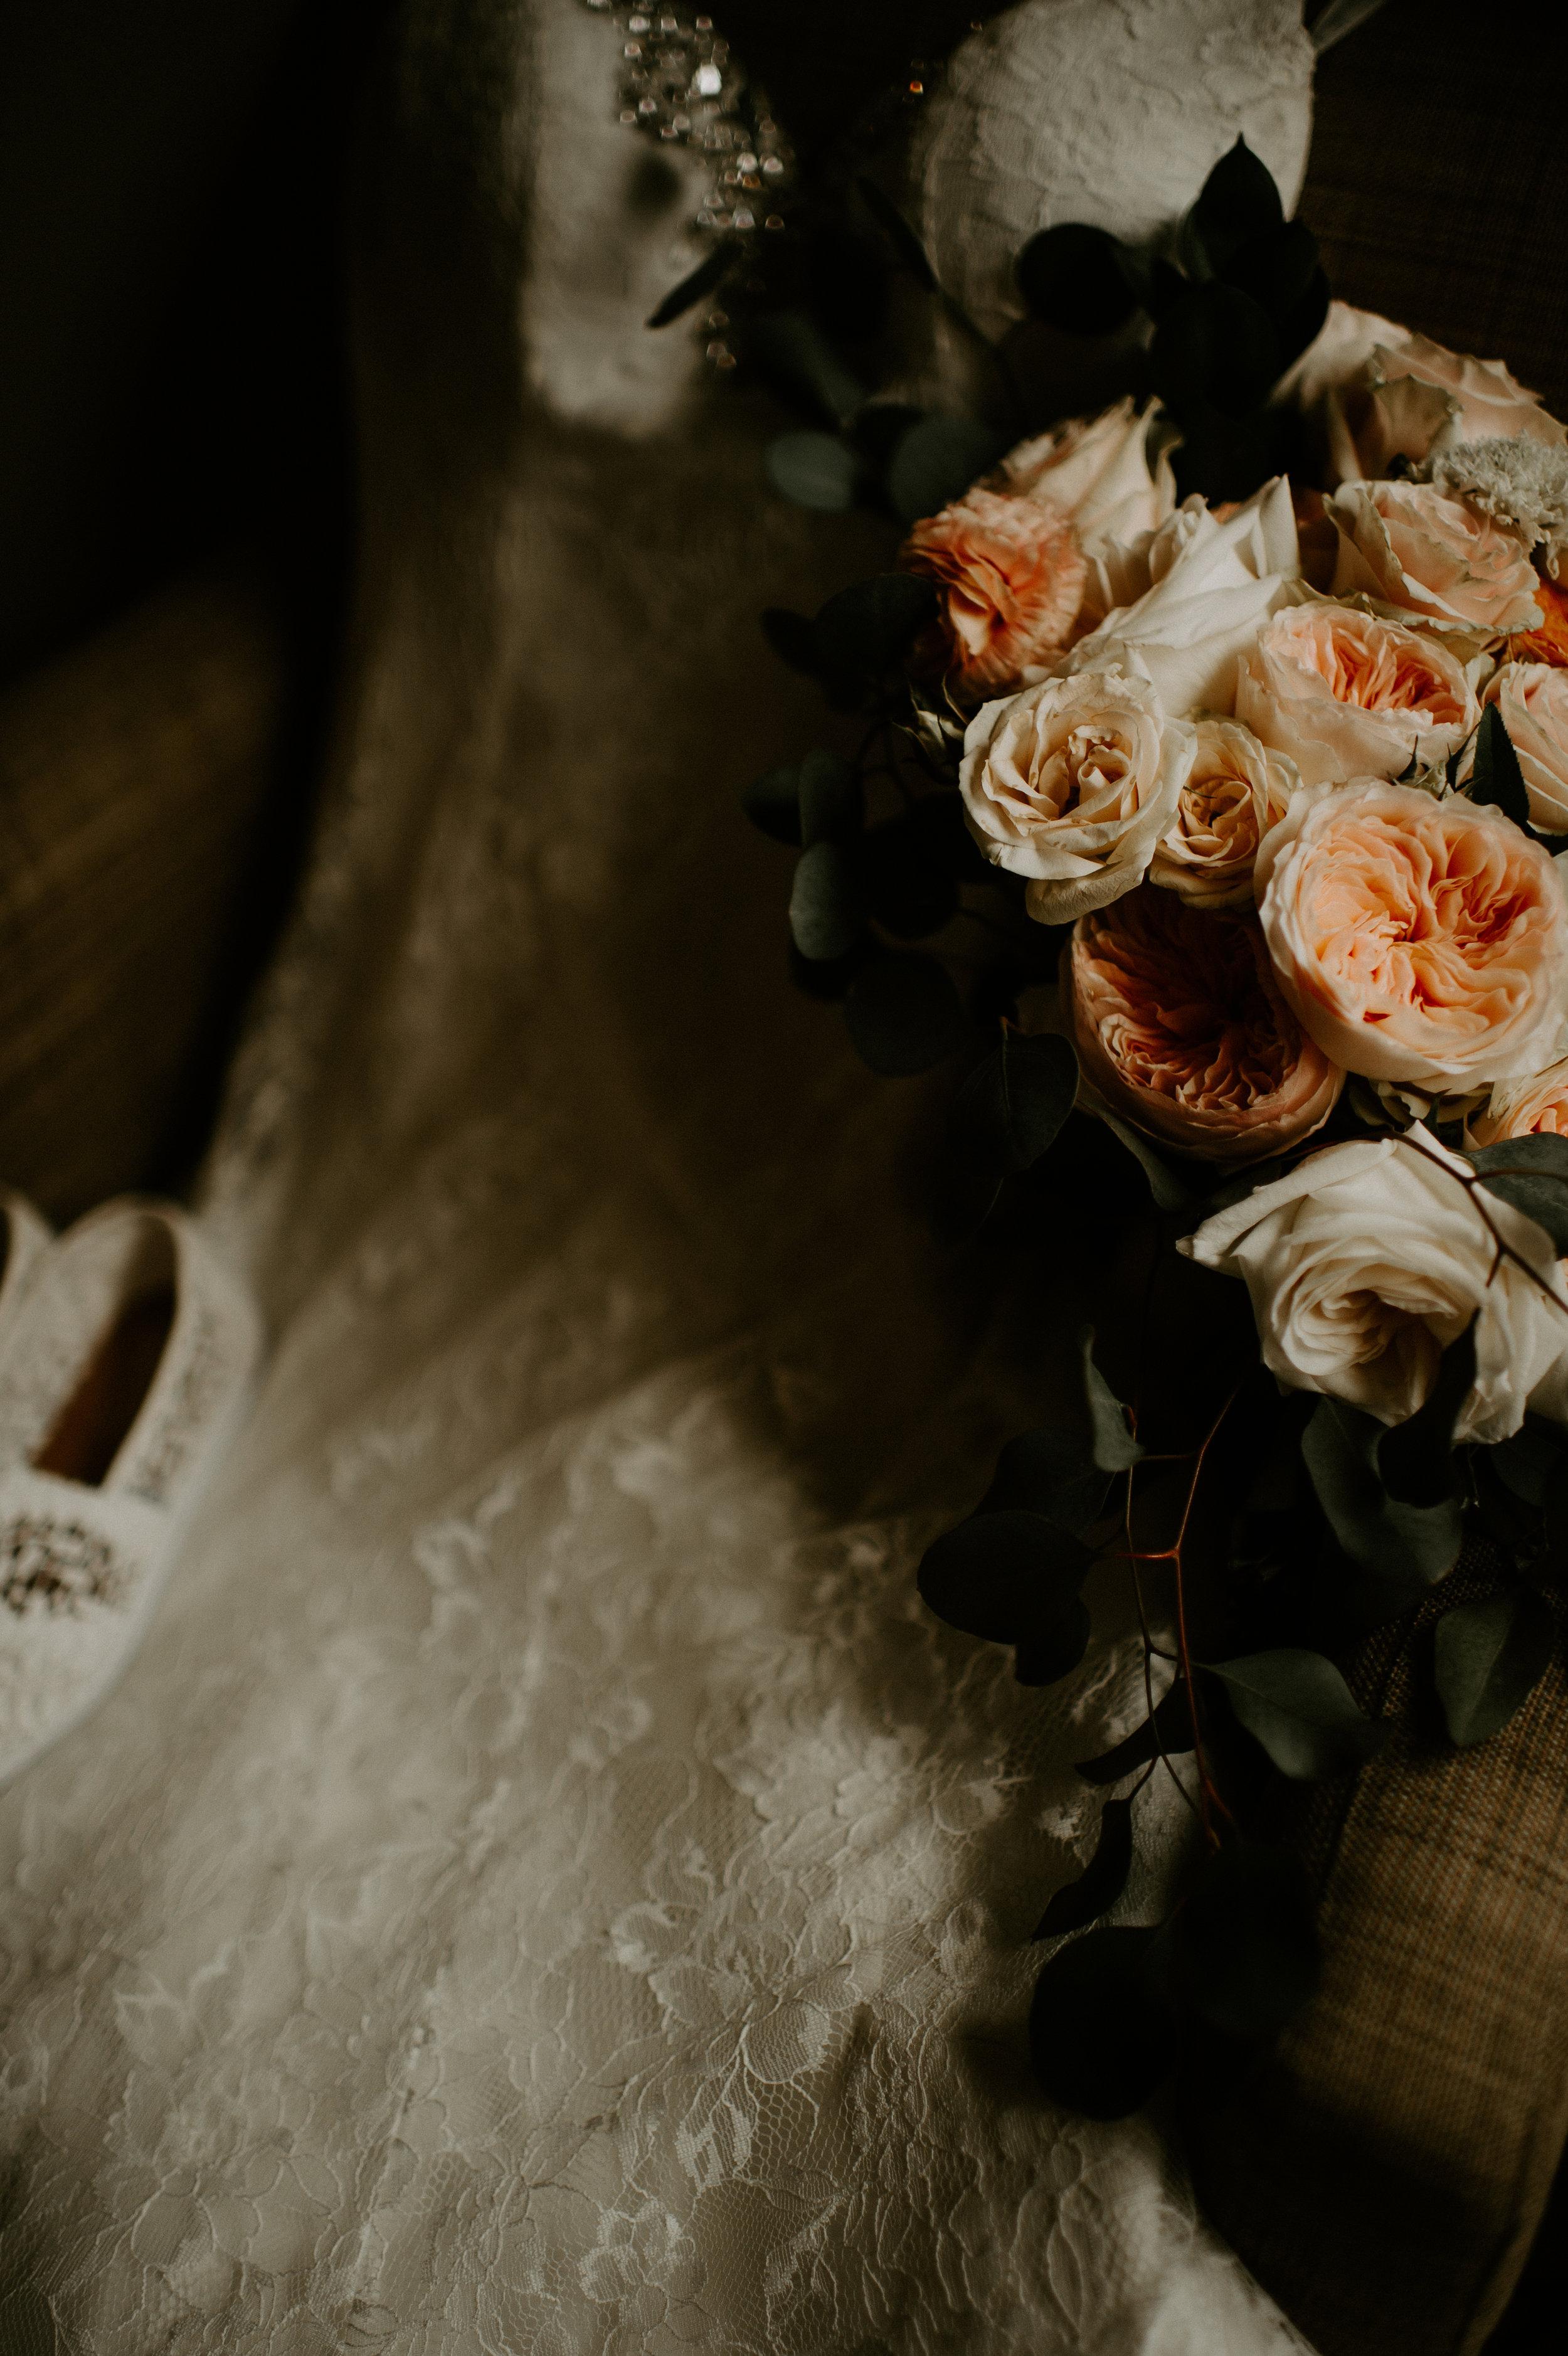 savannah-bridal-shop-andrea-and-mike-evergold-photography-georgia-state-railroad-museum-wedding-savannah-wedding-florist-savannah-wedding-planner-3.jpg